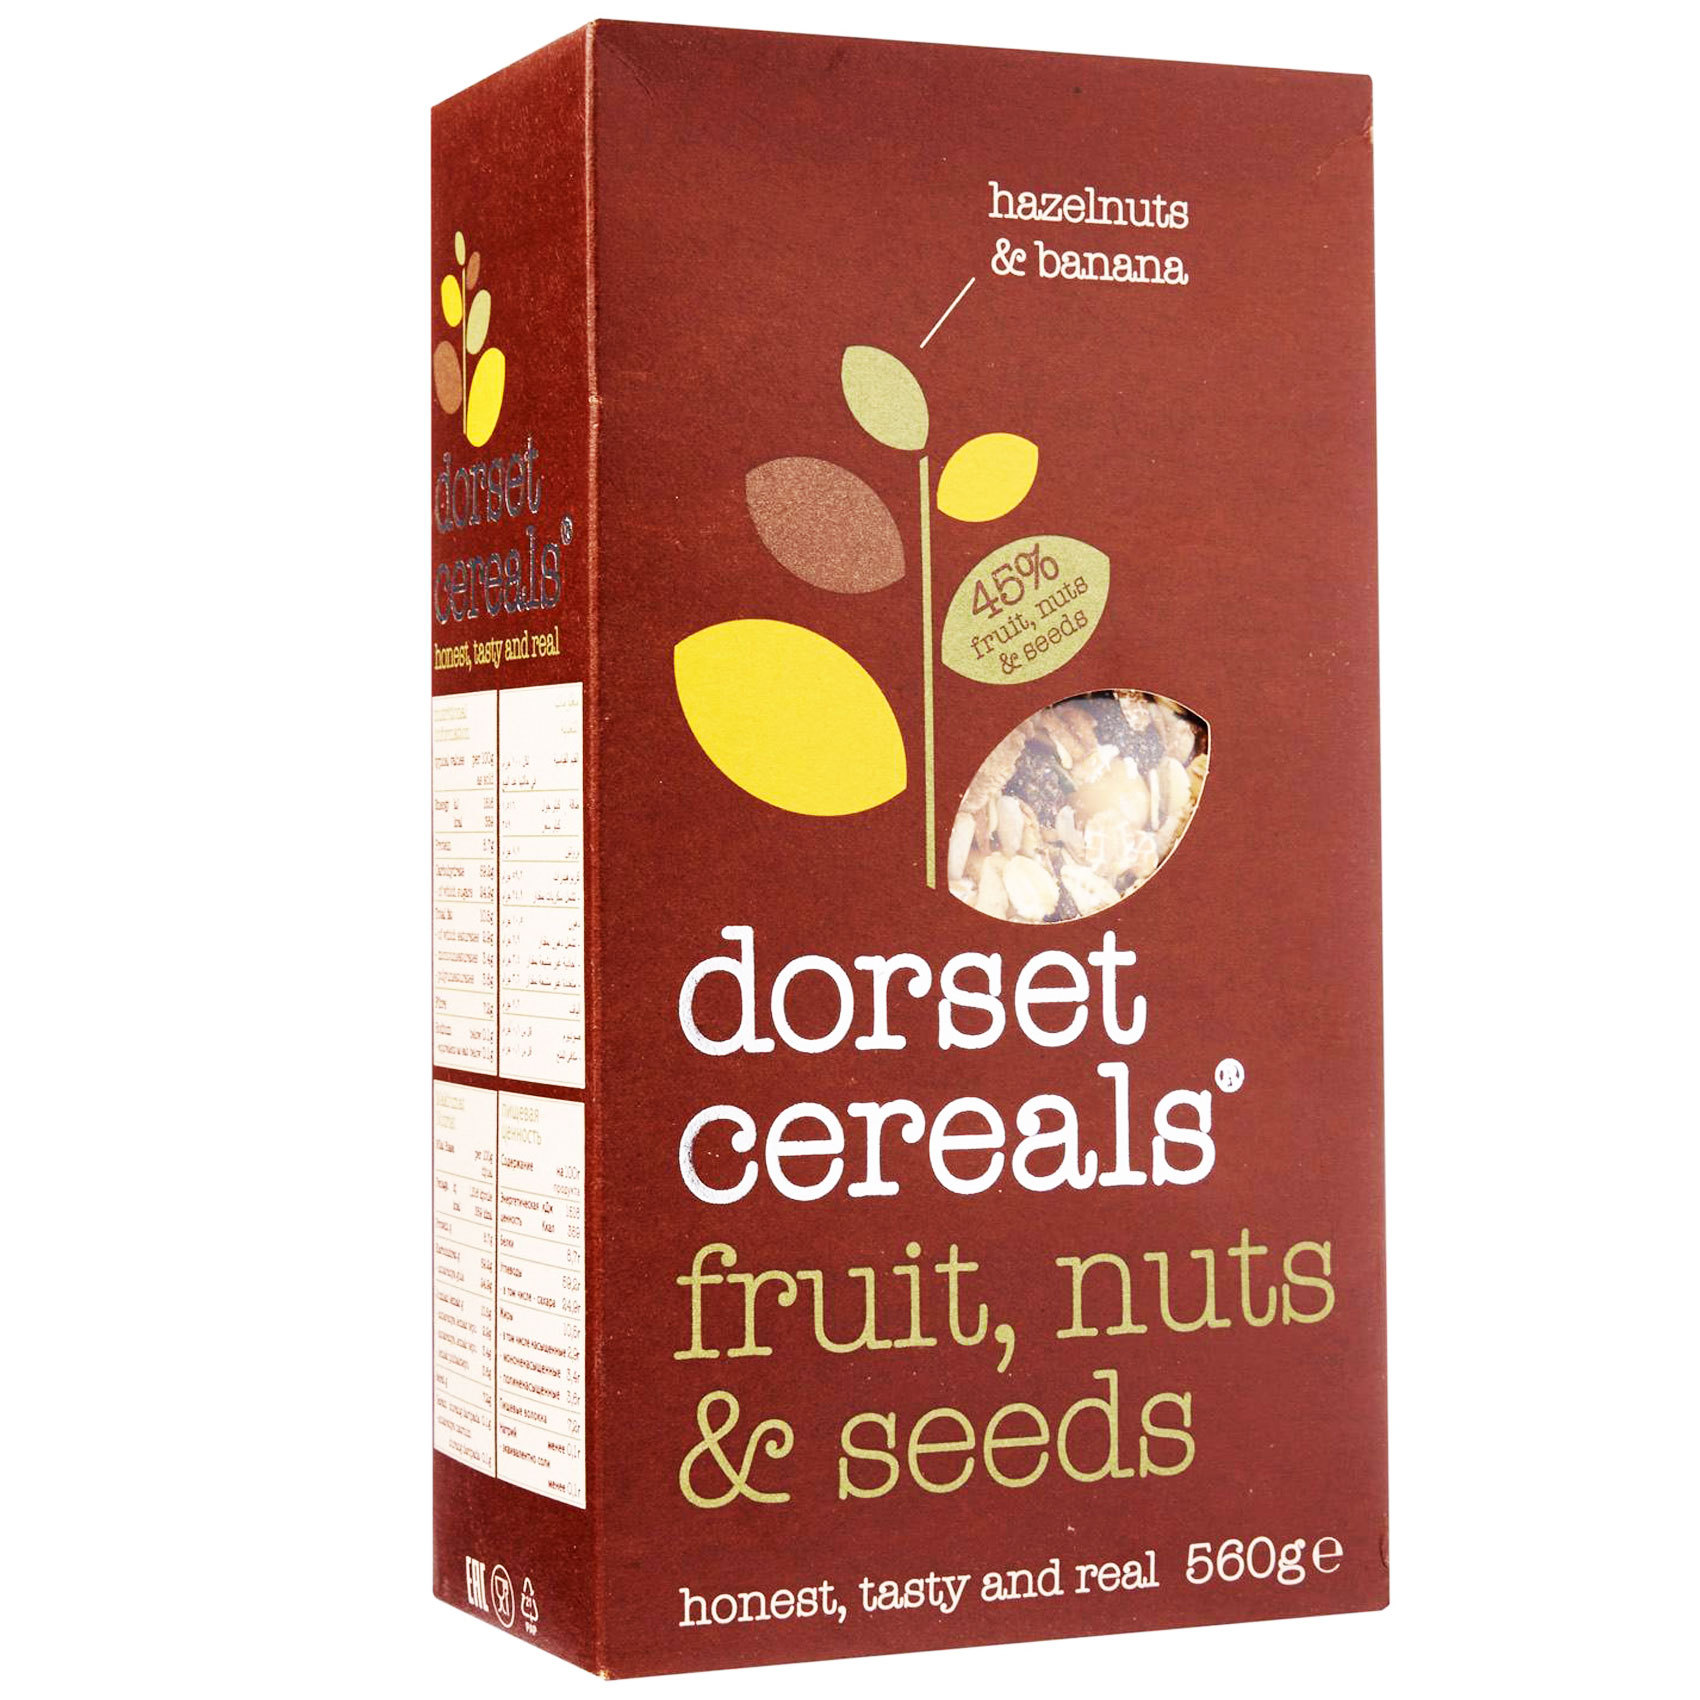 DORSET FRTS NUTS & SEEDS CRLS 560G